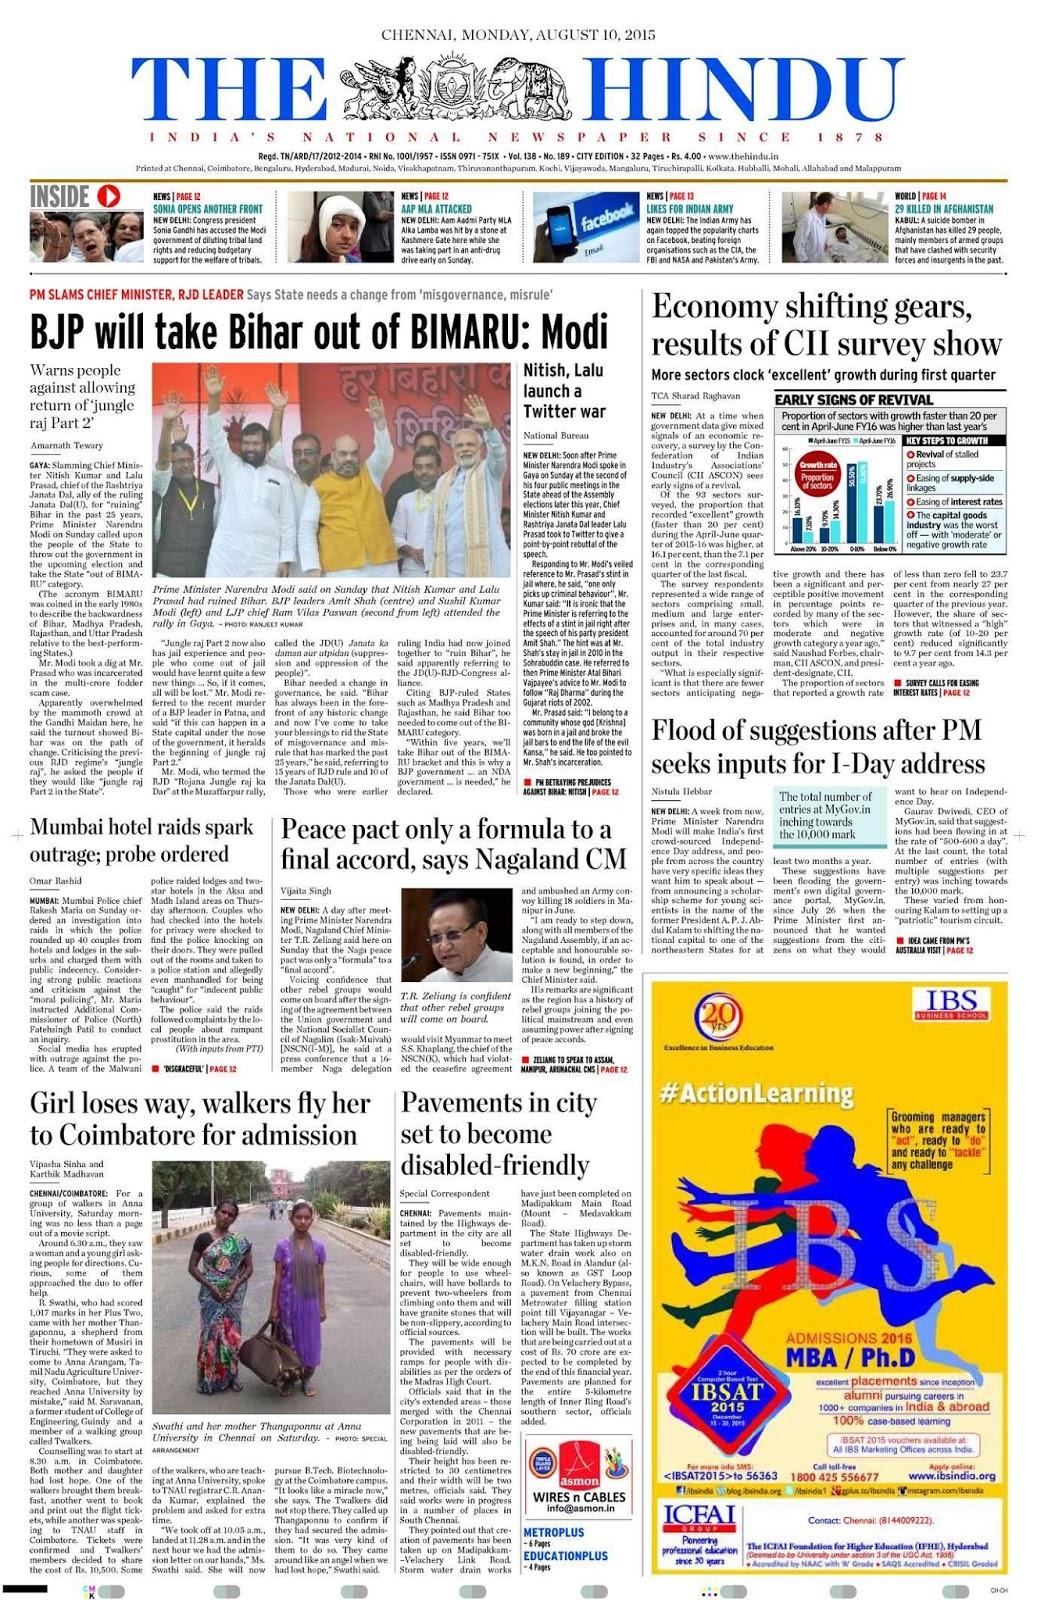 HINDU NEWSPAPER YESTERDAY EPUB